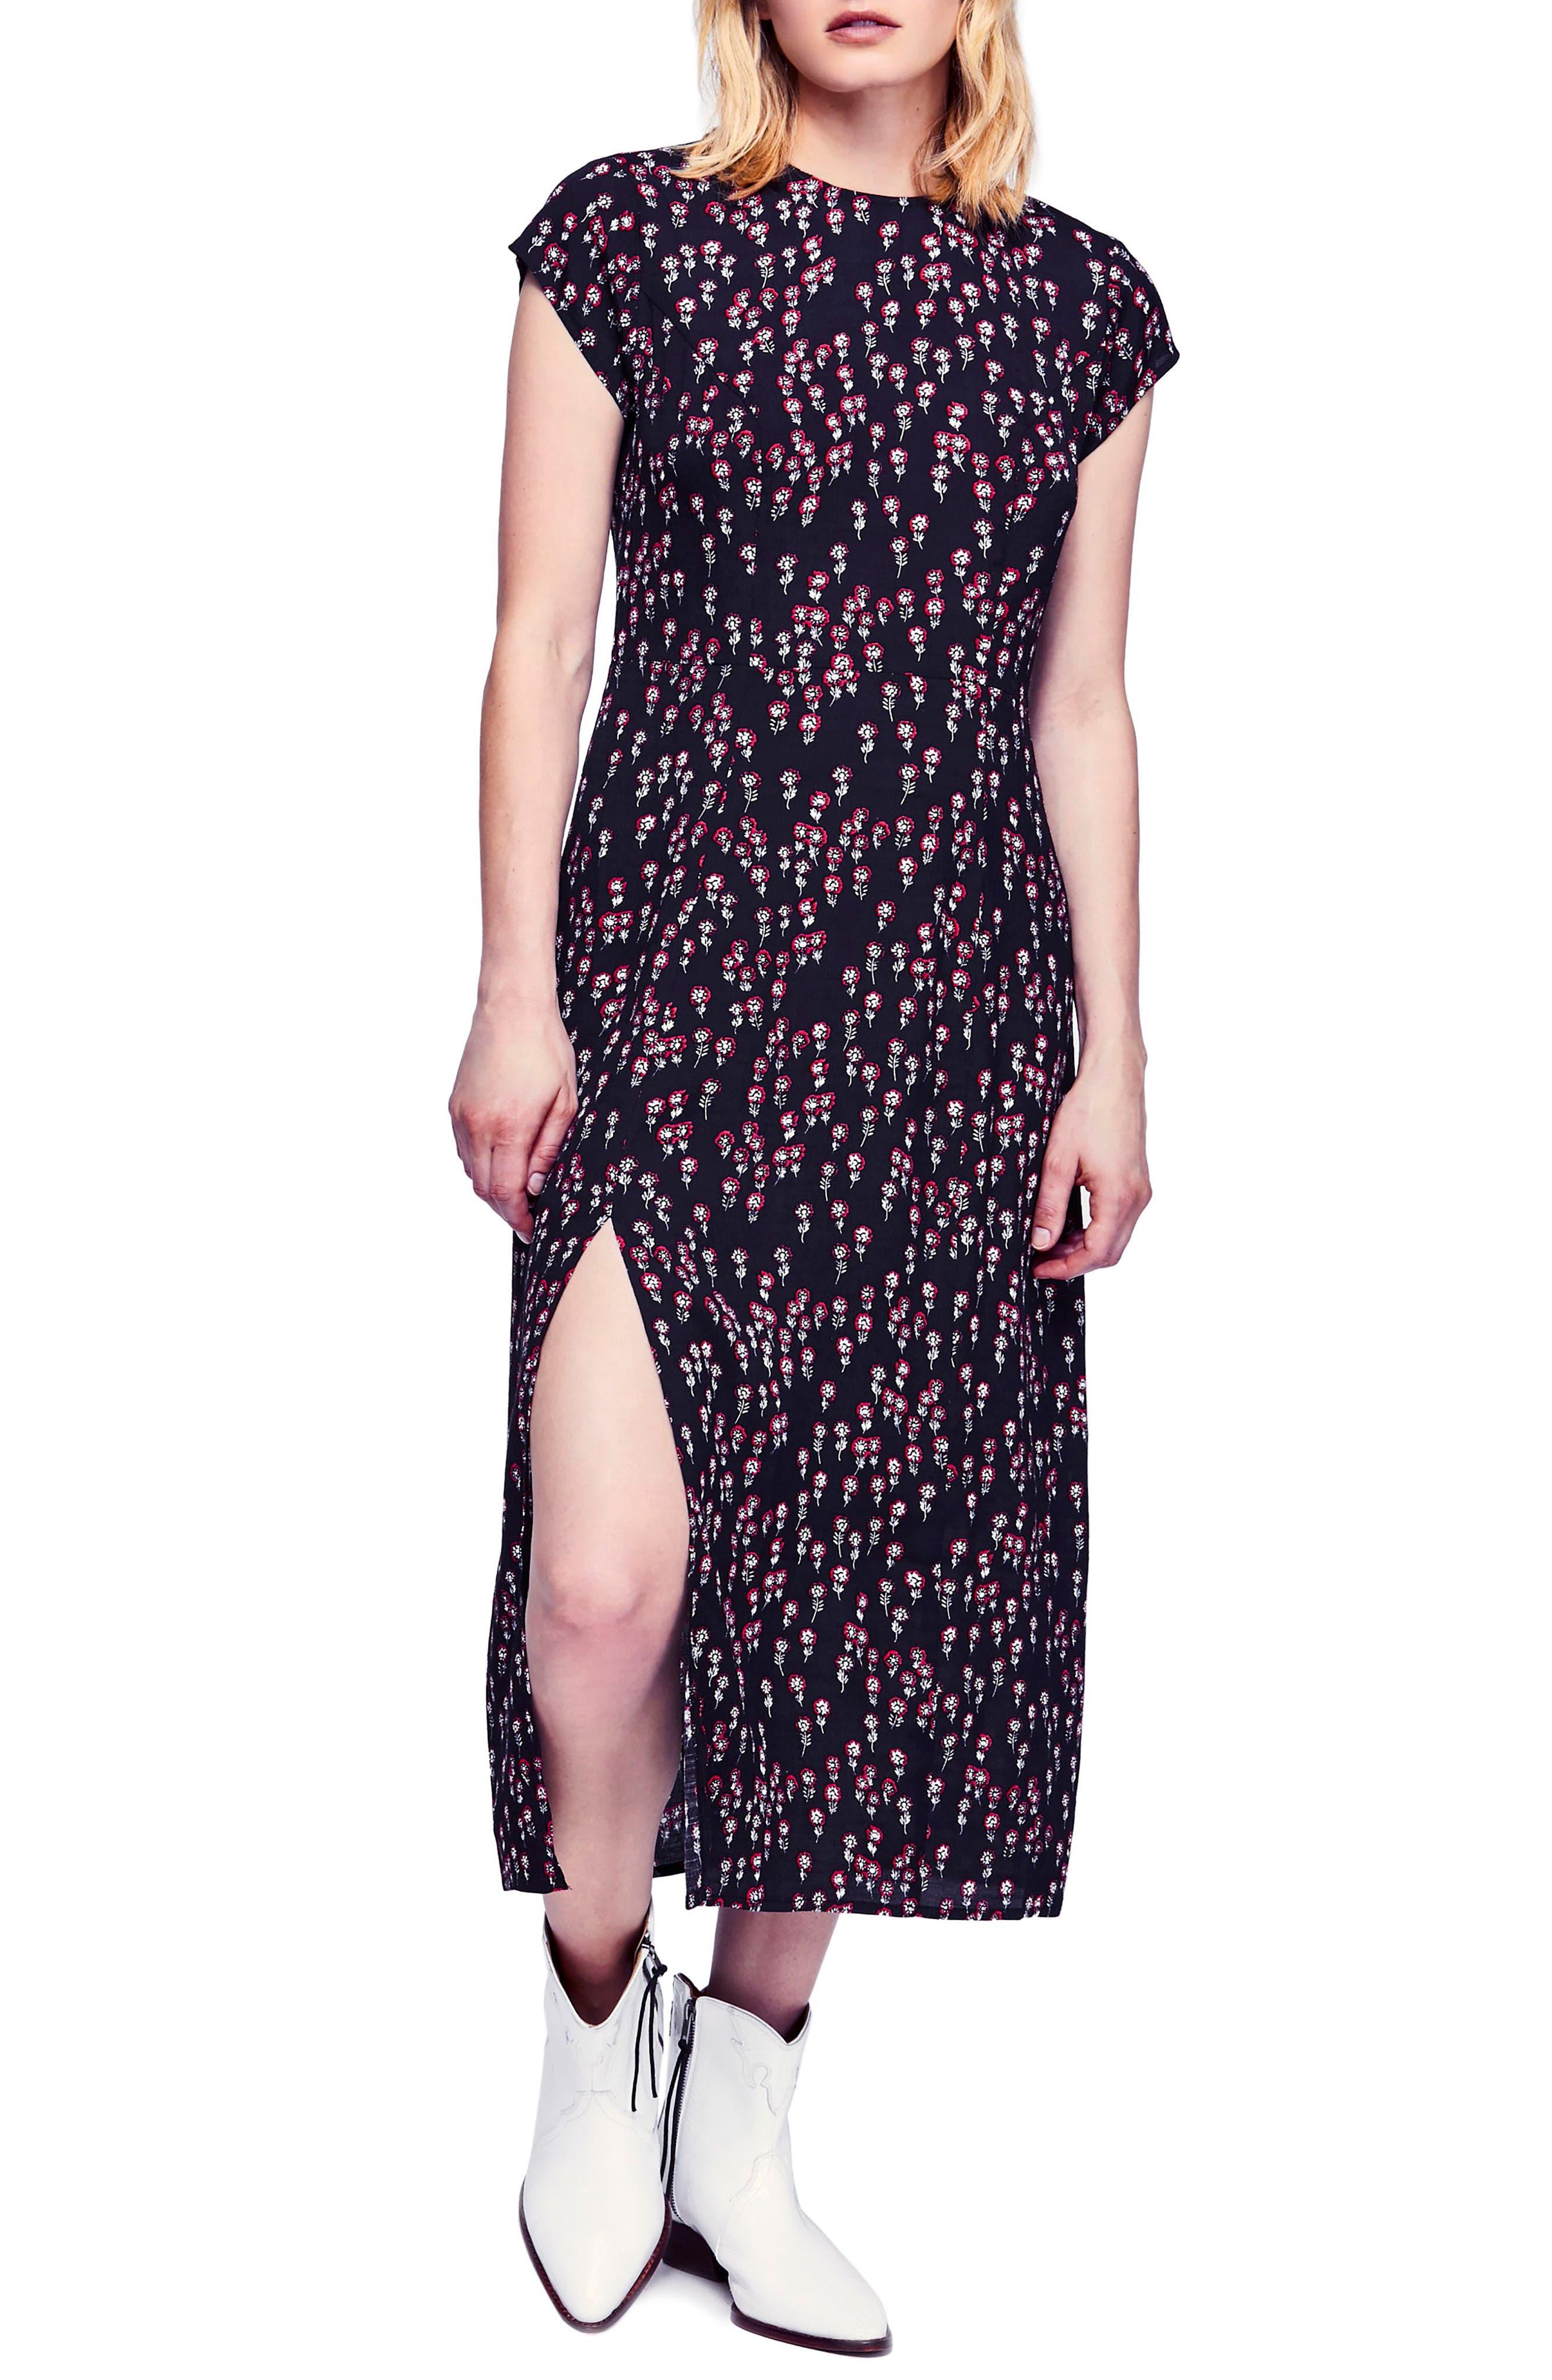 FREE PEOPLE,                             Corrie Midi Dress,                             Main thumbnail 1, color,                             BLACK